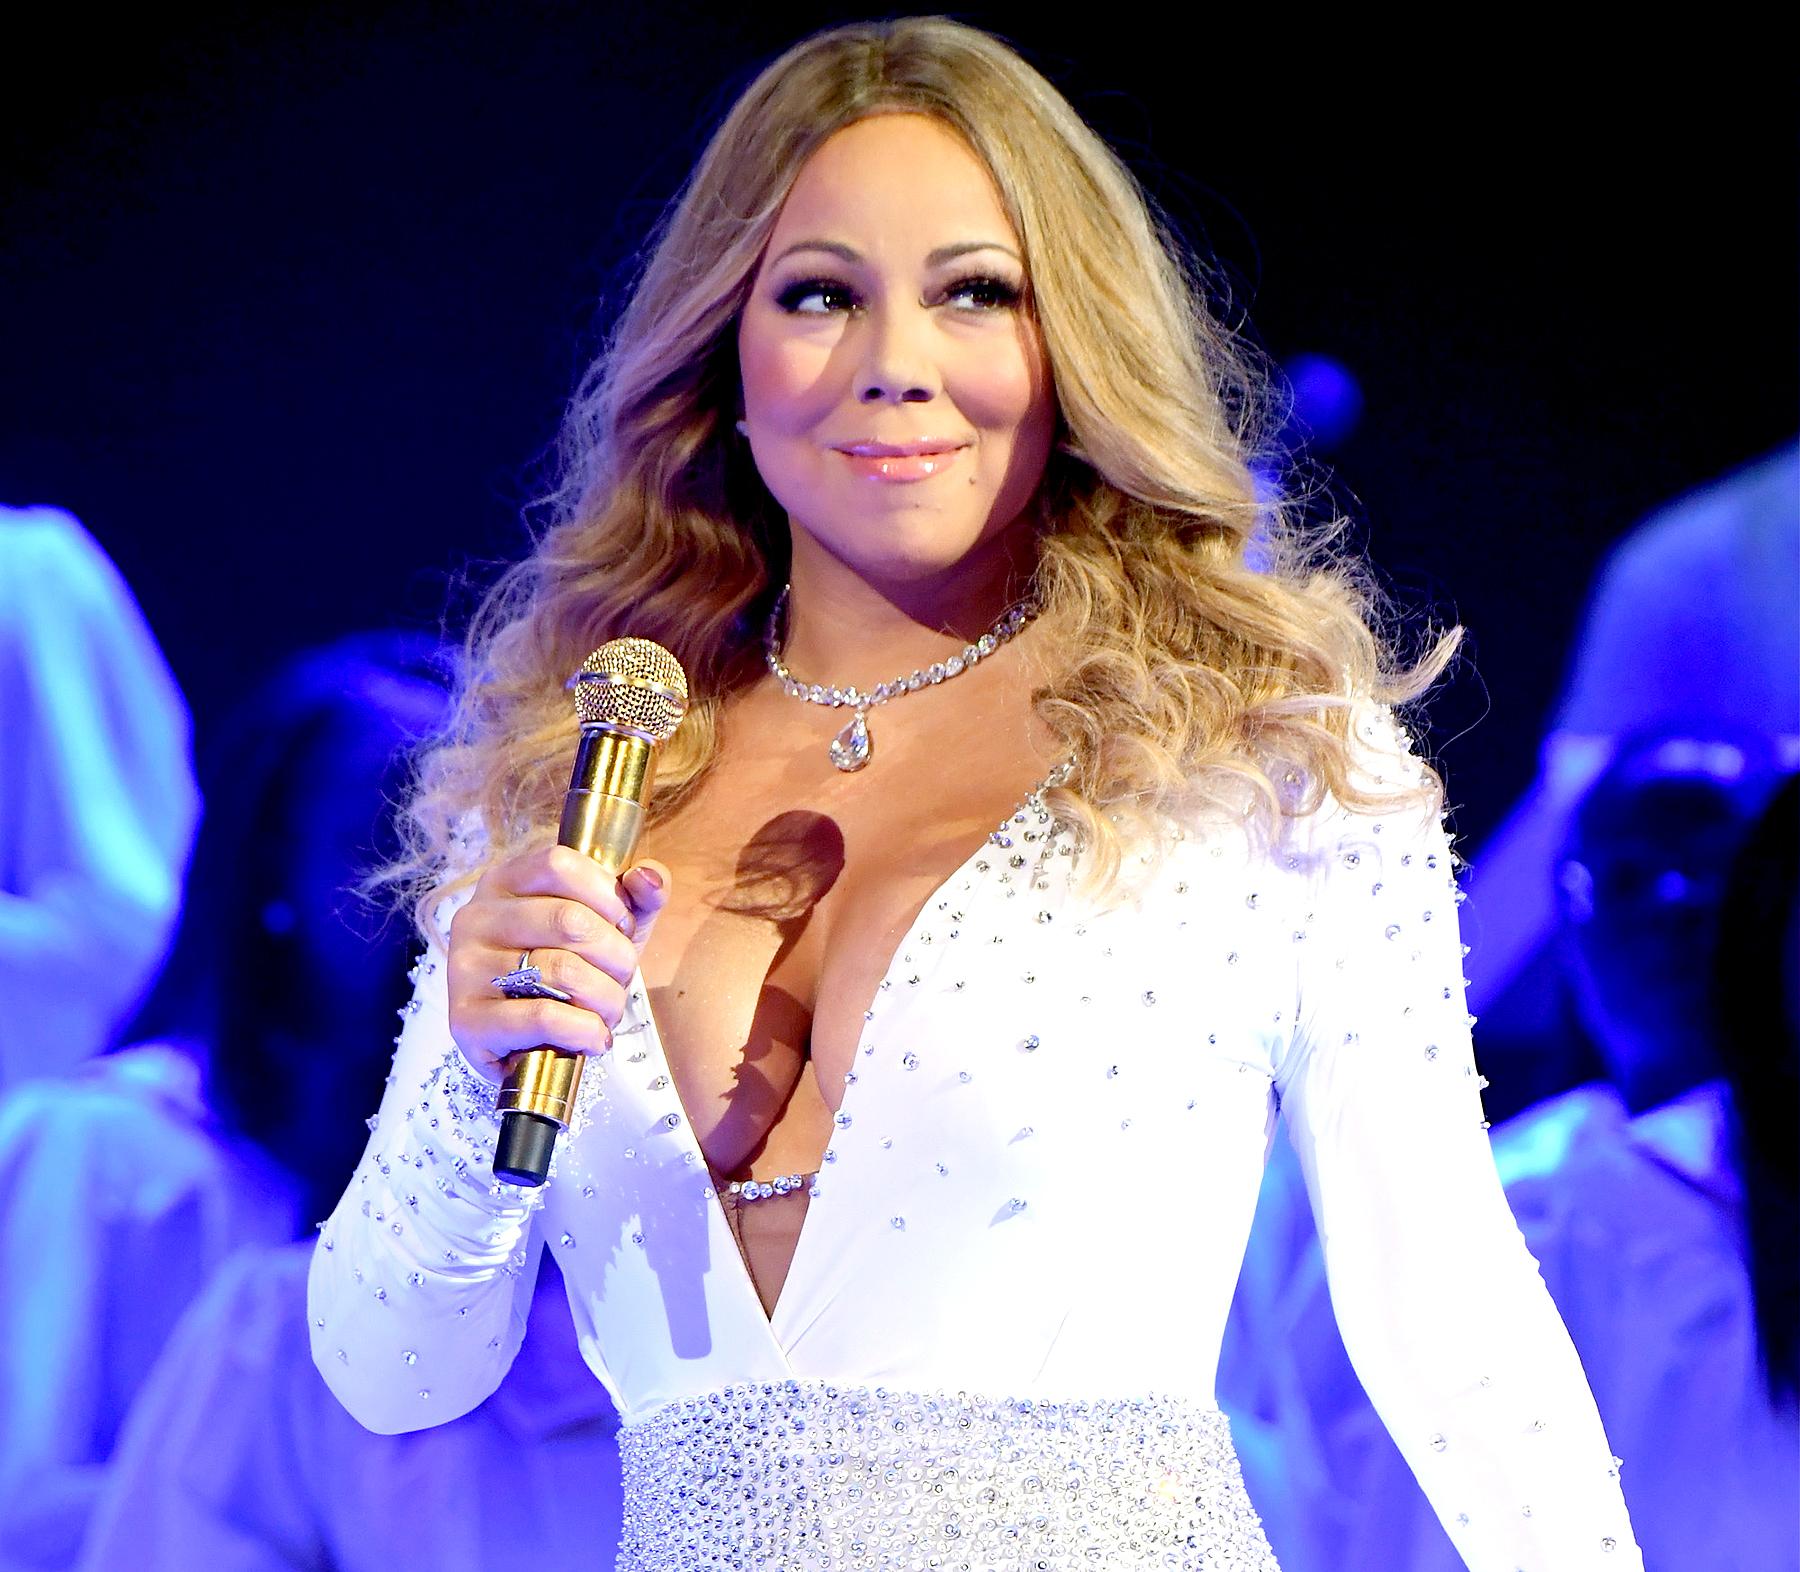 Mariah Carey will headline the event.